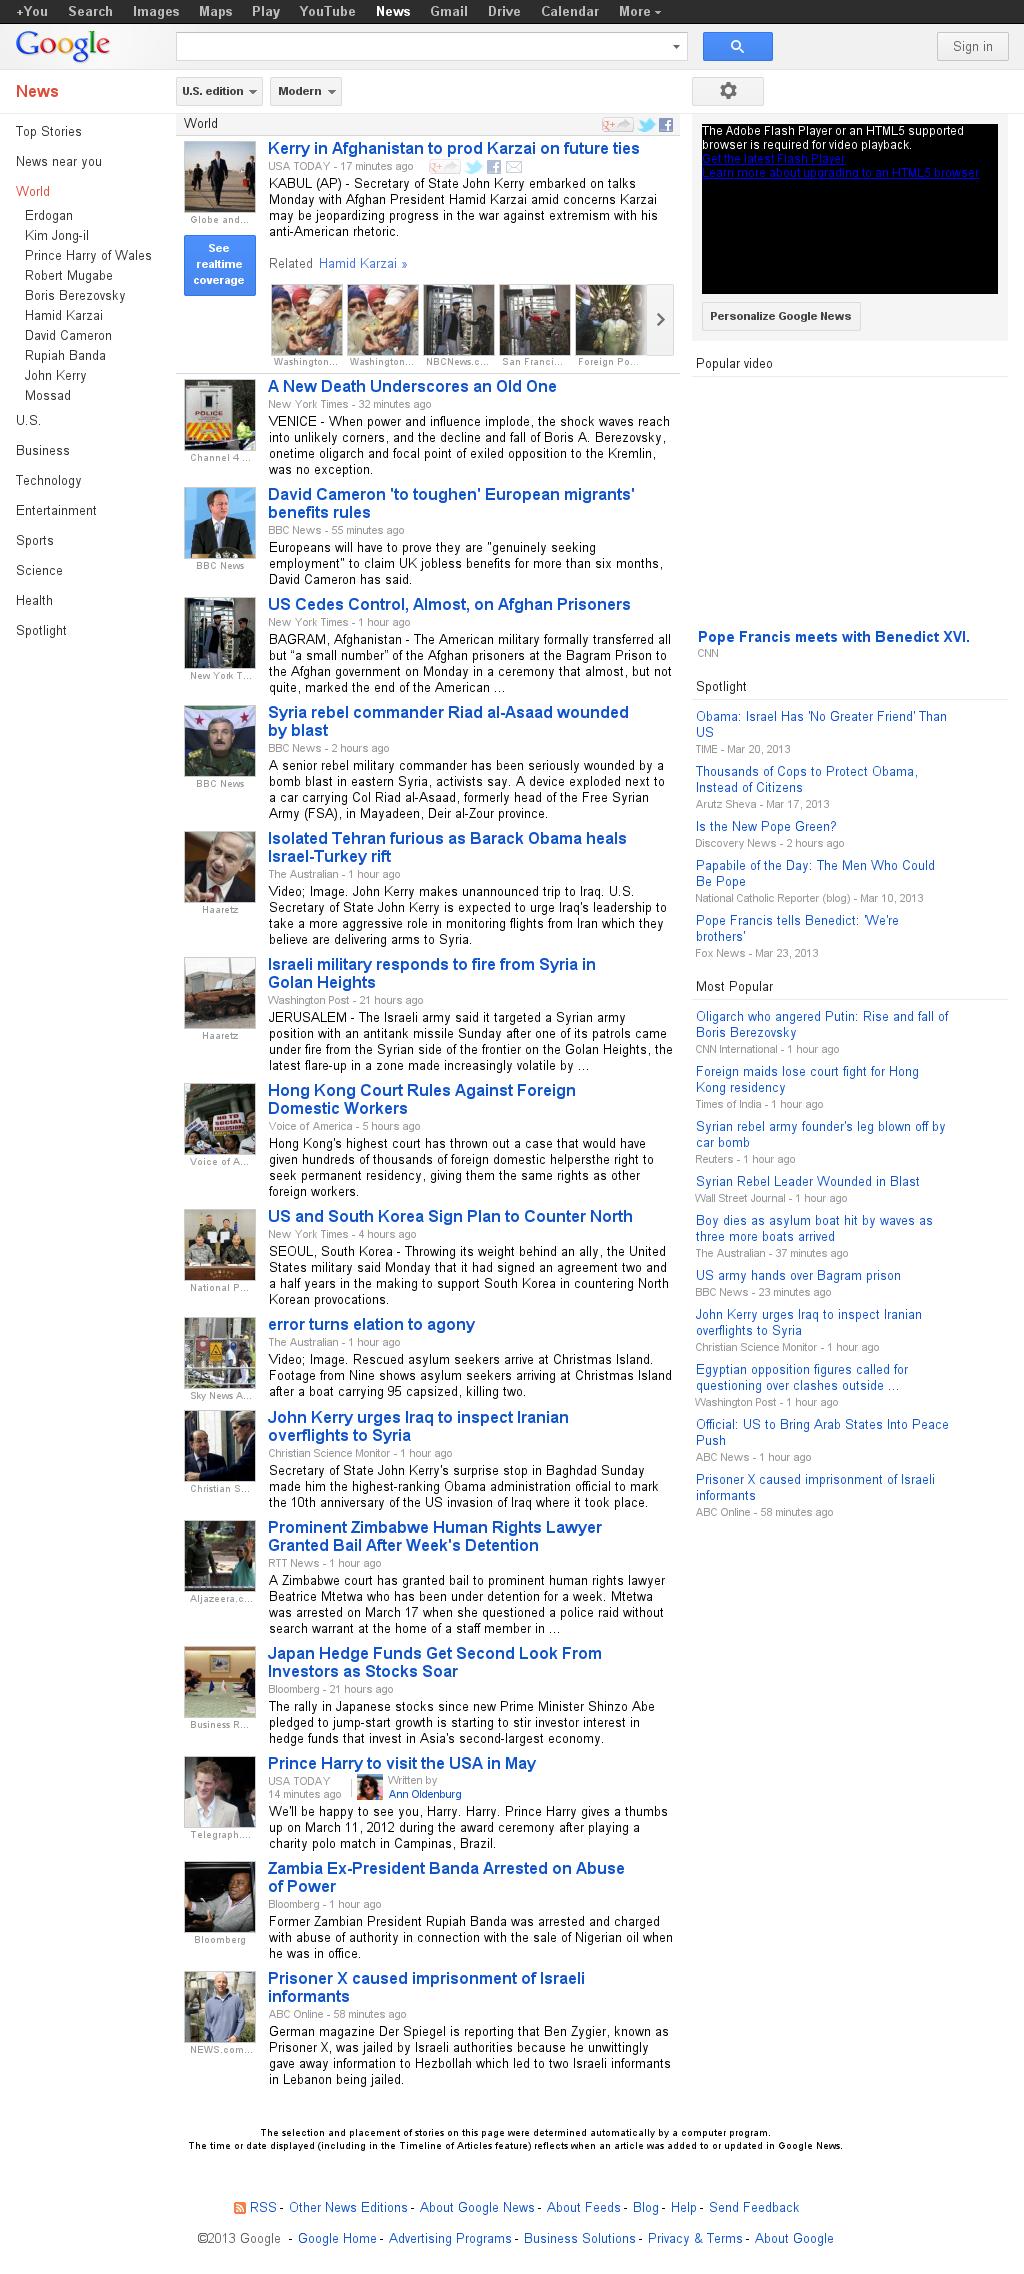 Google News: World at Monday March 25, 2013, 2:22 p.m. UTC